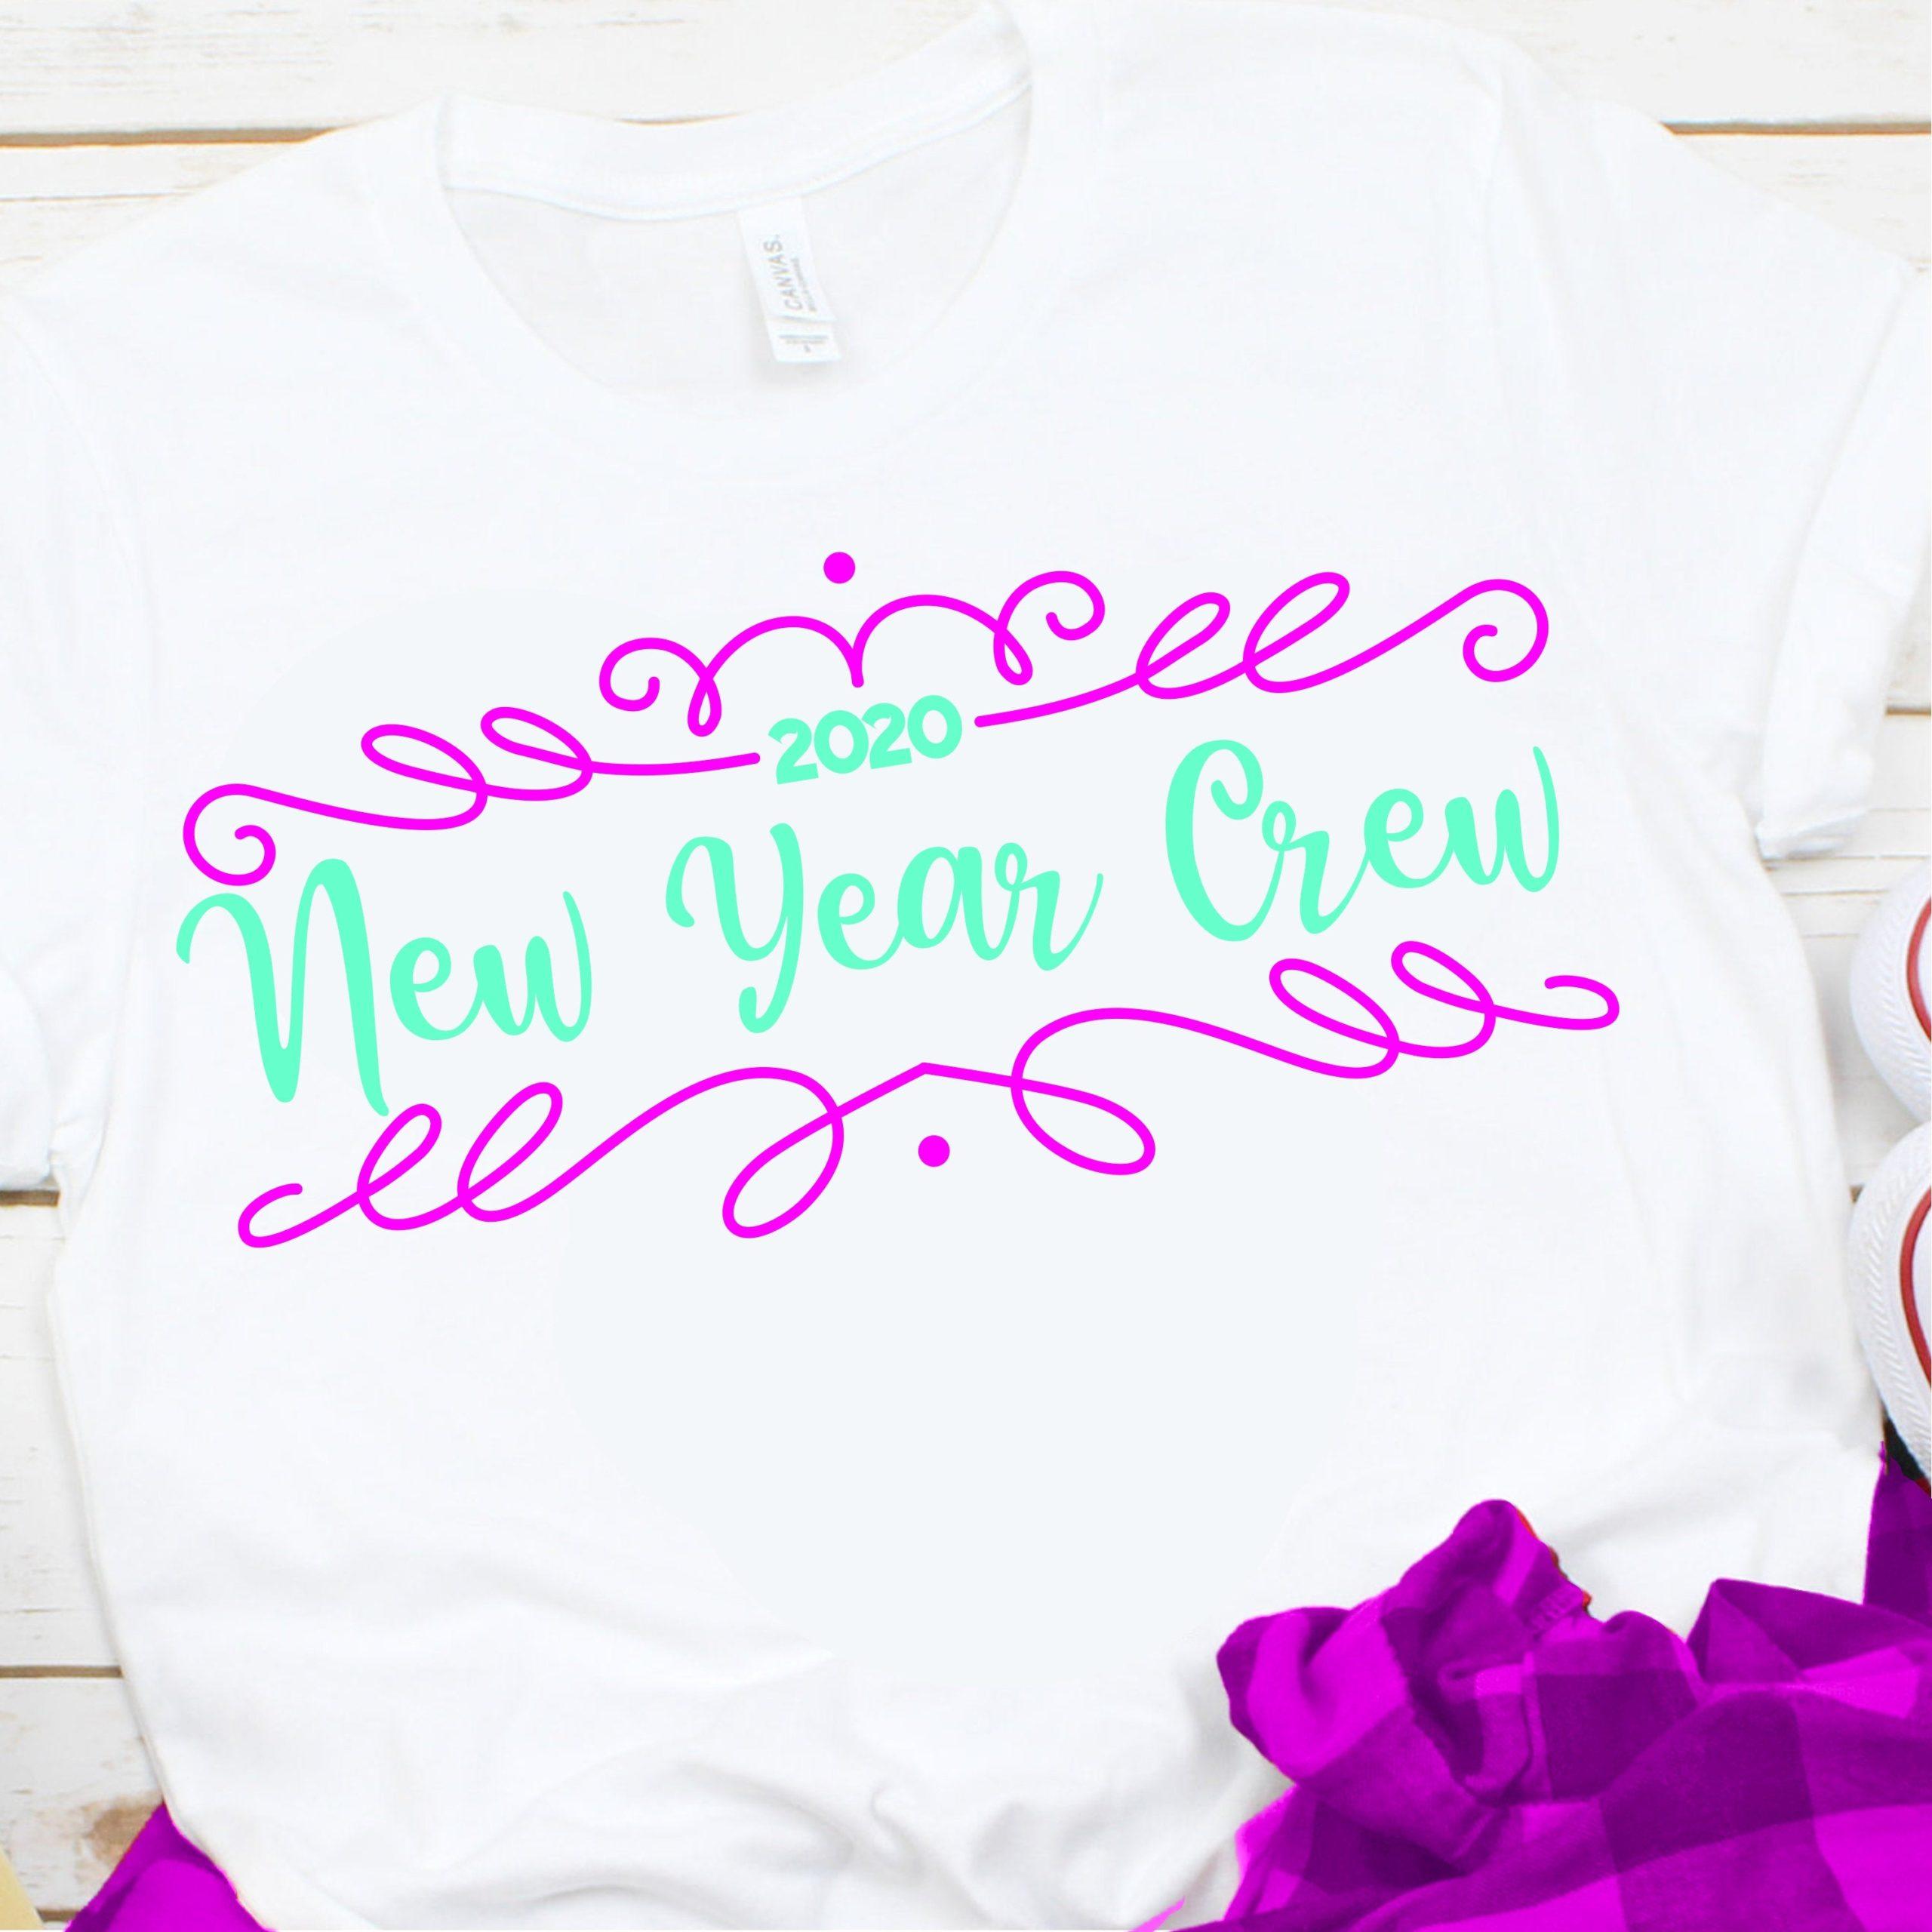 Happy-new-year-svgnew-year-crew-svgcrew-svghappy-new-year-svgnew-year-shirt-svgnew-year-tshirtsvg-for-cricut2020-happy-new-year-svg-5e2210e5